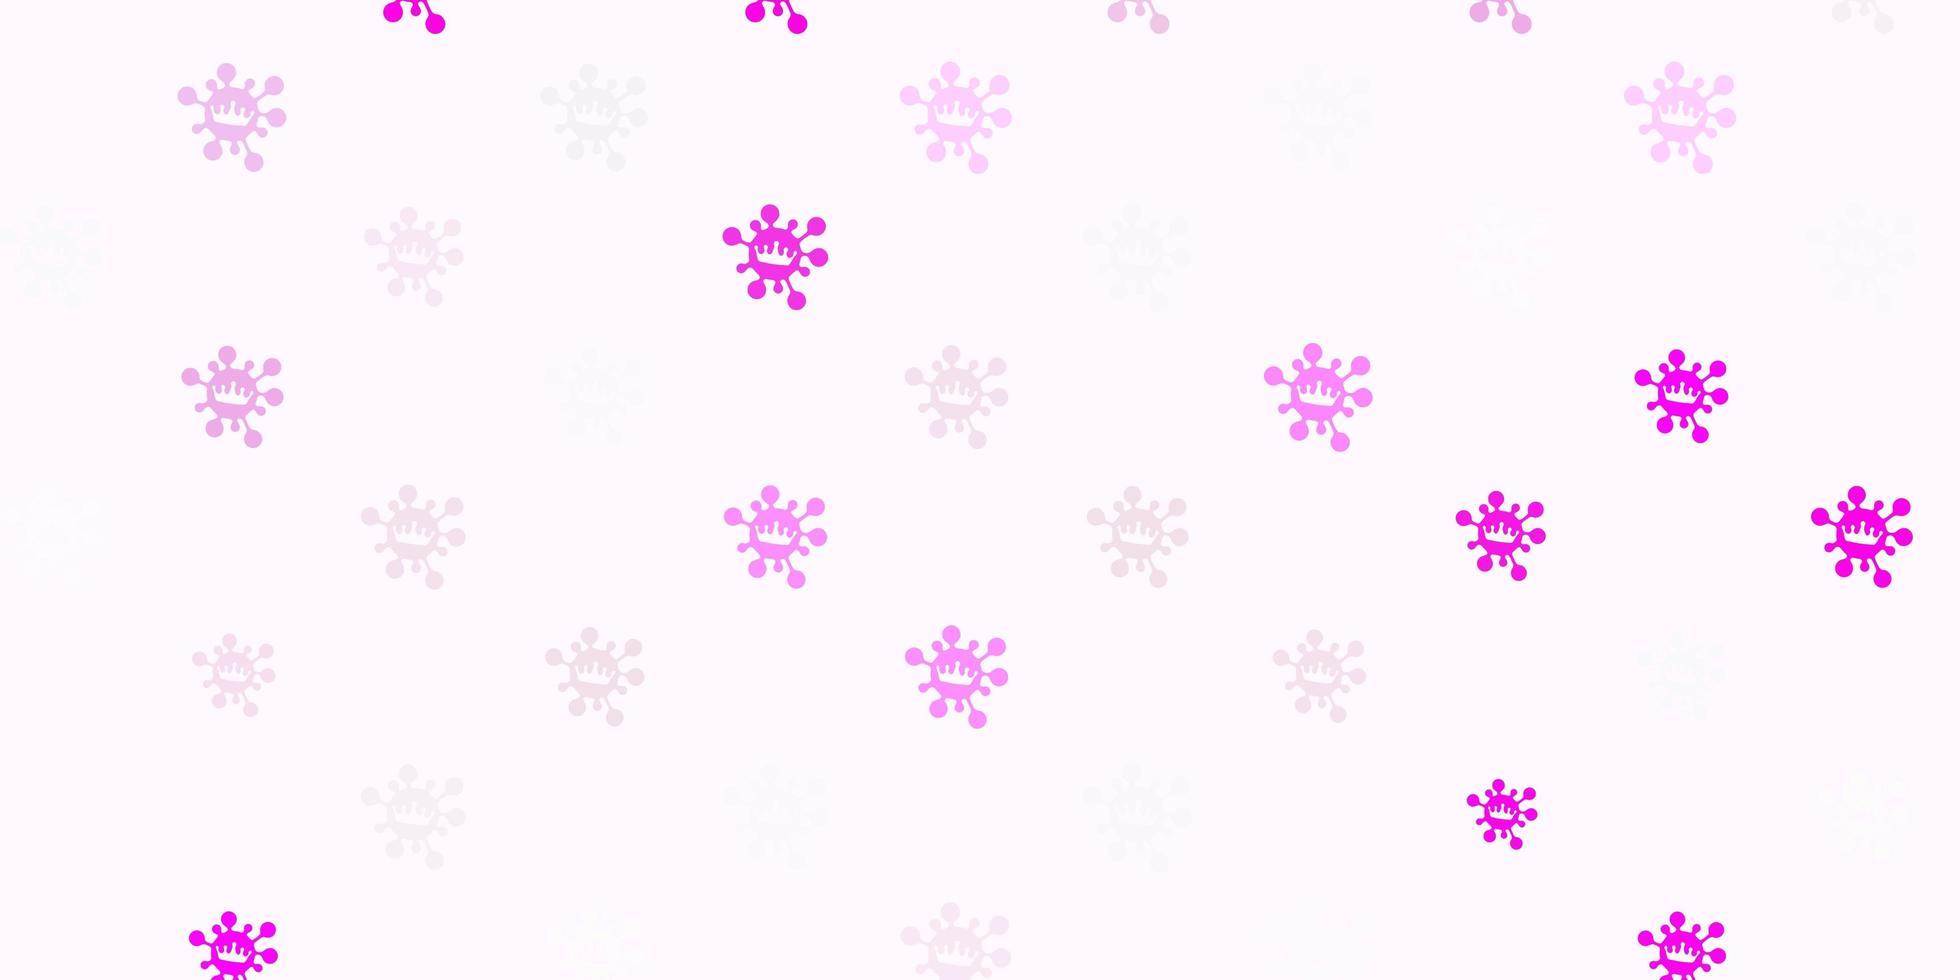 Light pink vector backdrop with virus symbols